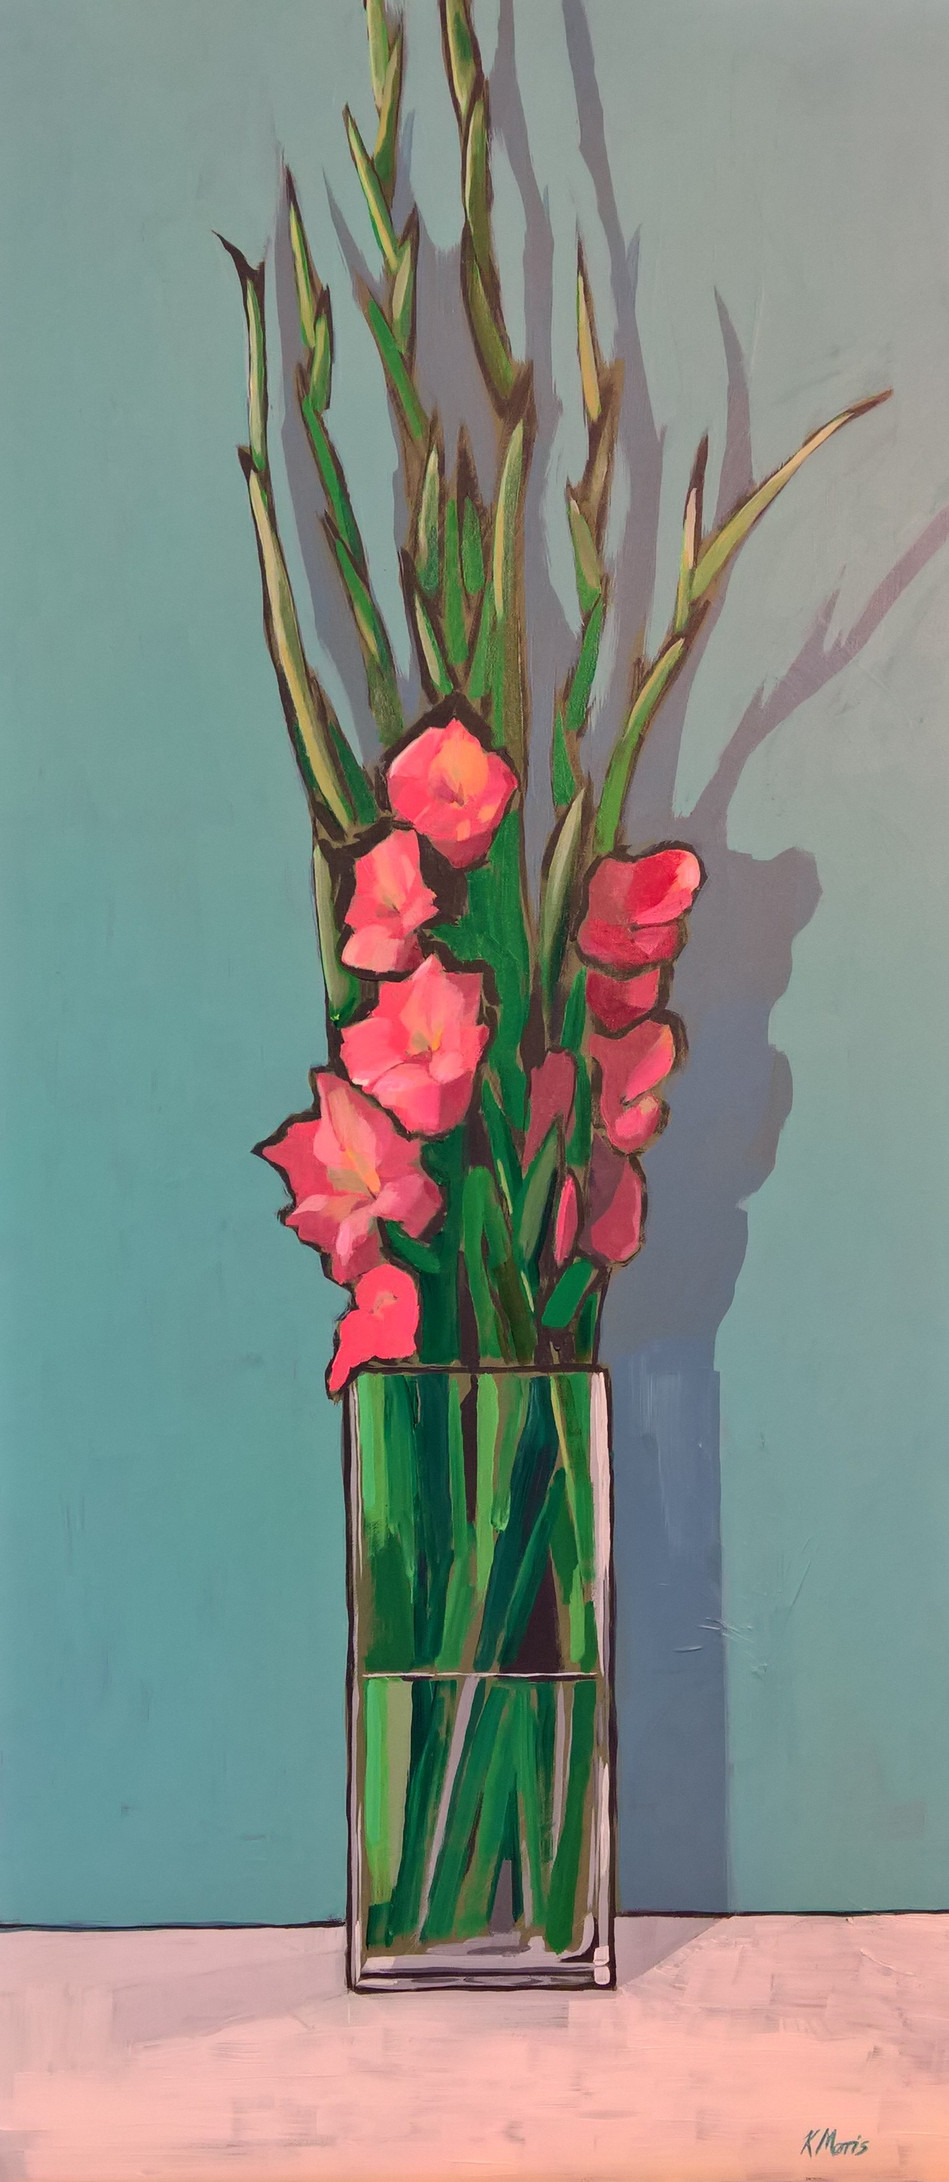 Gladiolas, acrylic on panel, 22 x 11